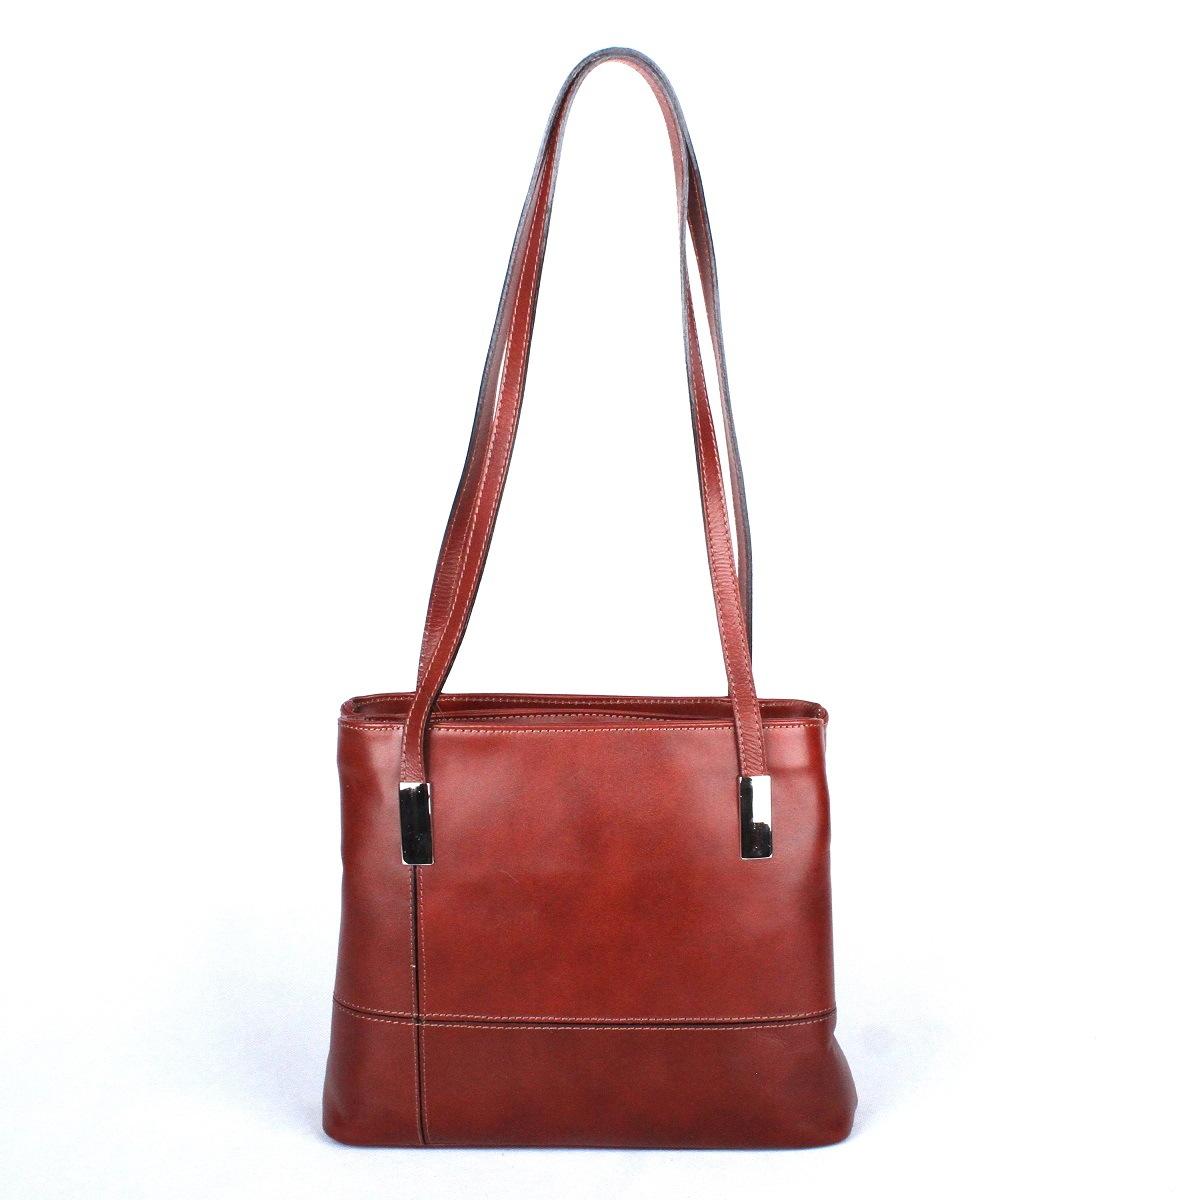 Dámská kožená kabelka na rameno no. 22 hnědá | KabelkyproVas,cz